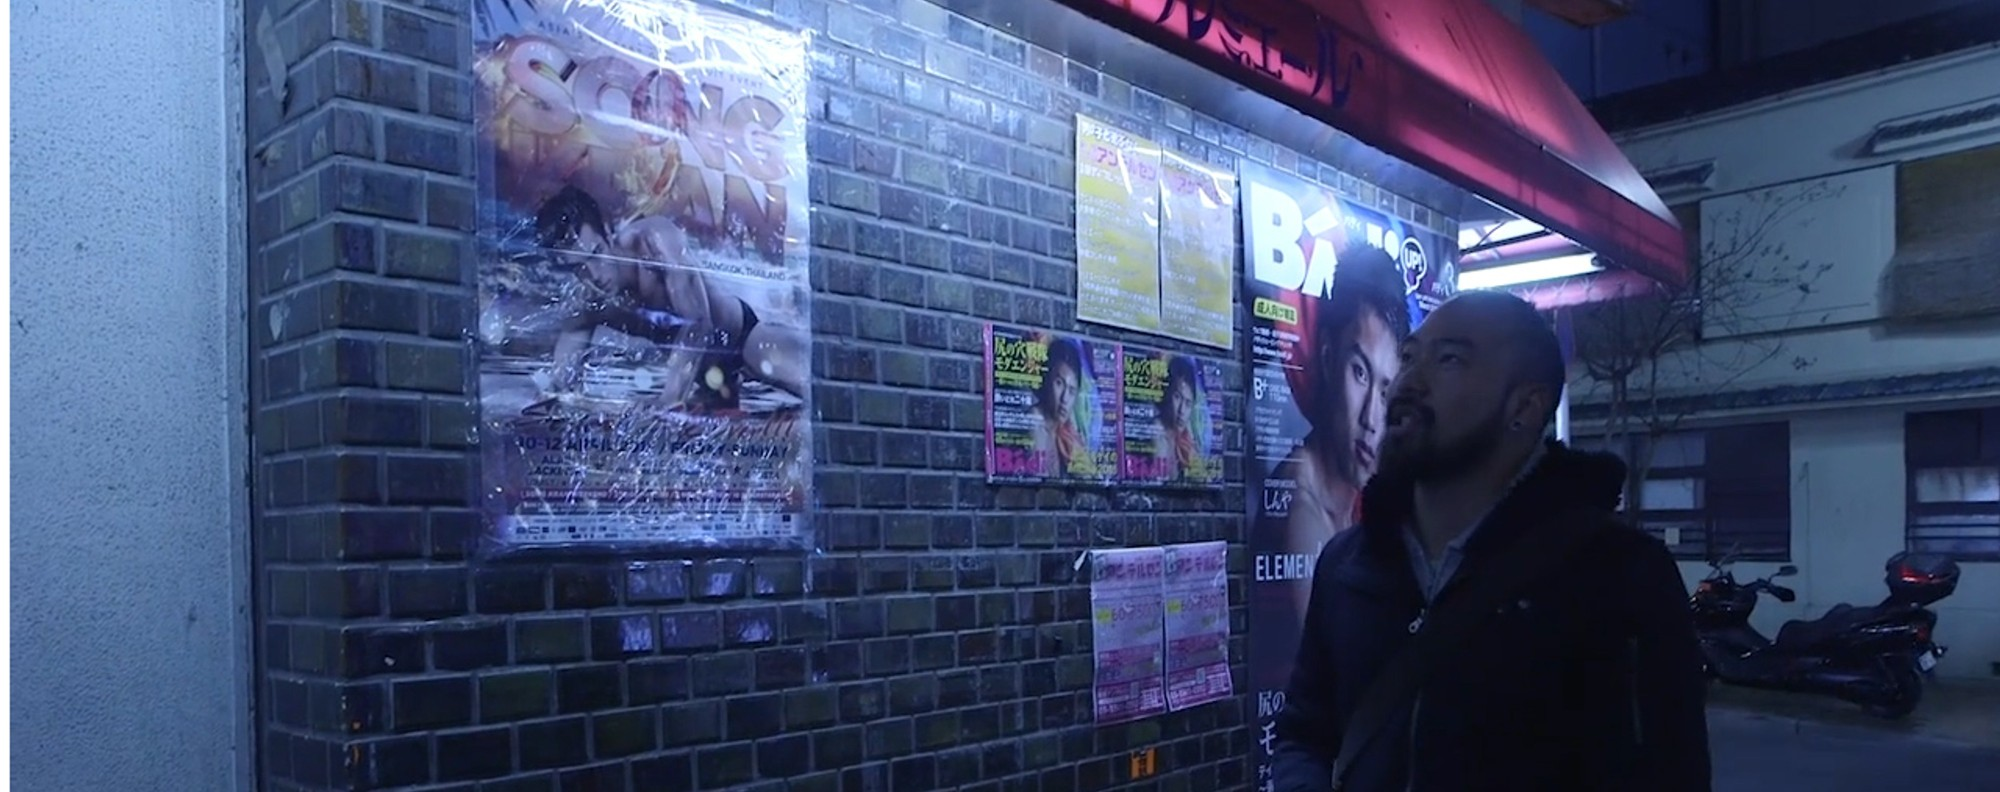 'Urisen' parlours that dot Tokyo's 2-chome gay district. Photo: Connie Kurtew